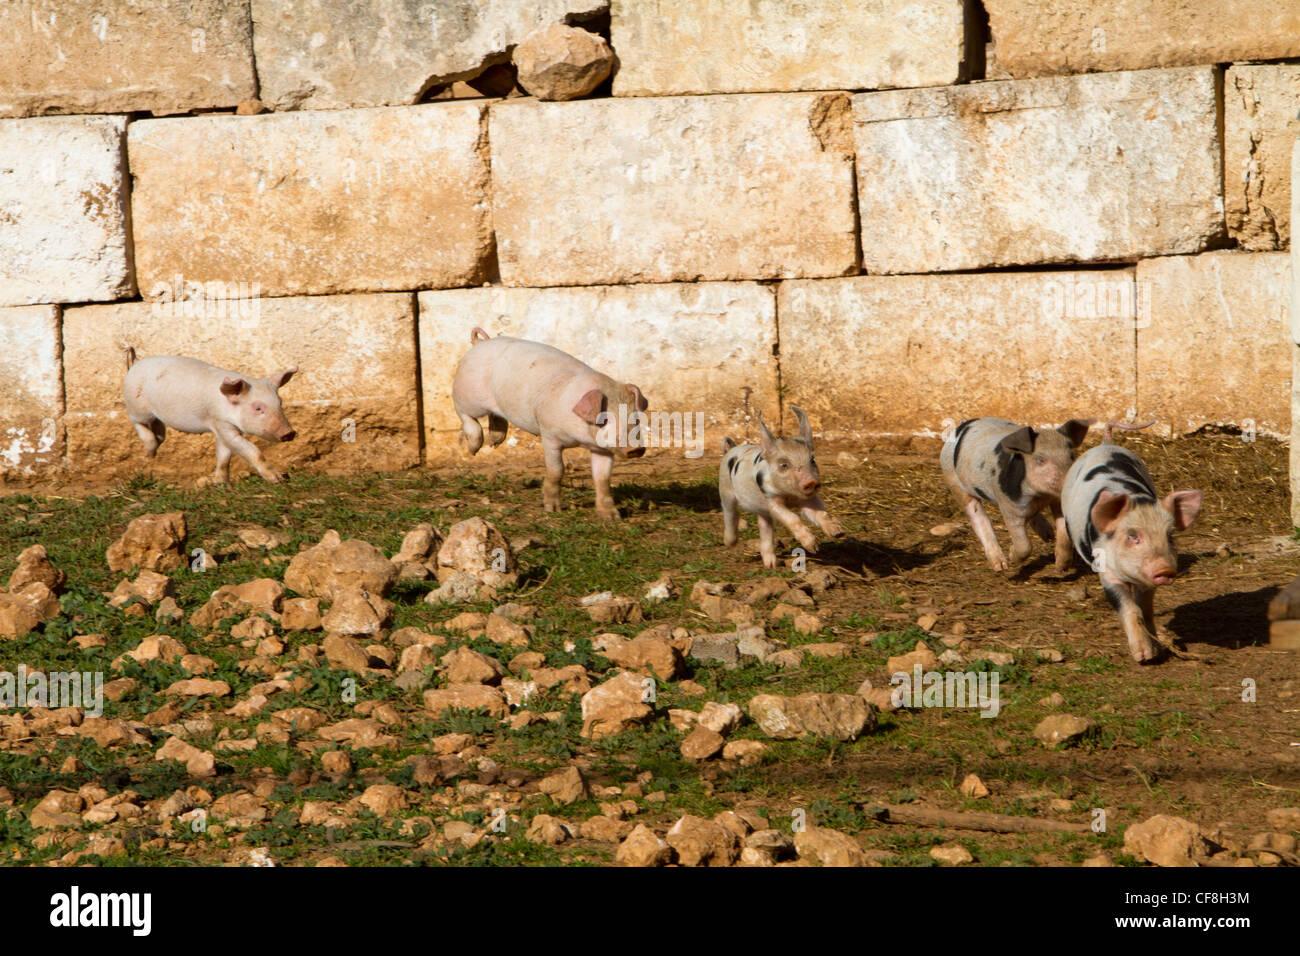 piglets hiberian Majorcan Mallorca Spain - Stock Image